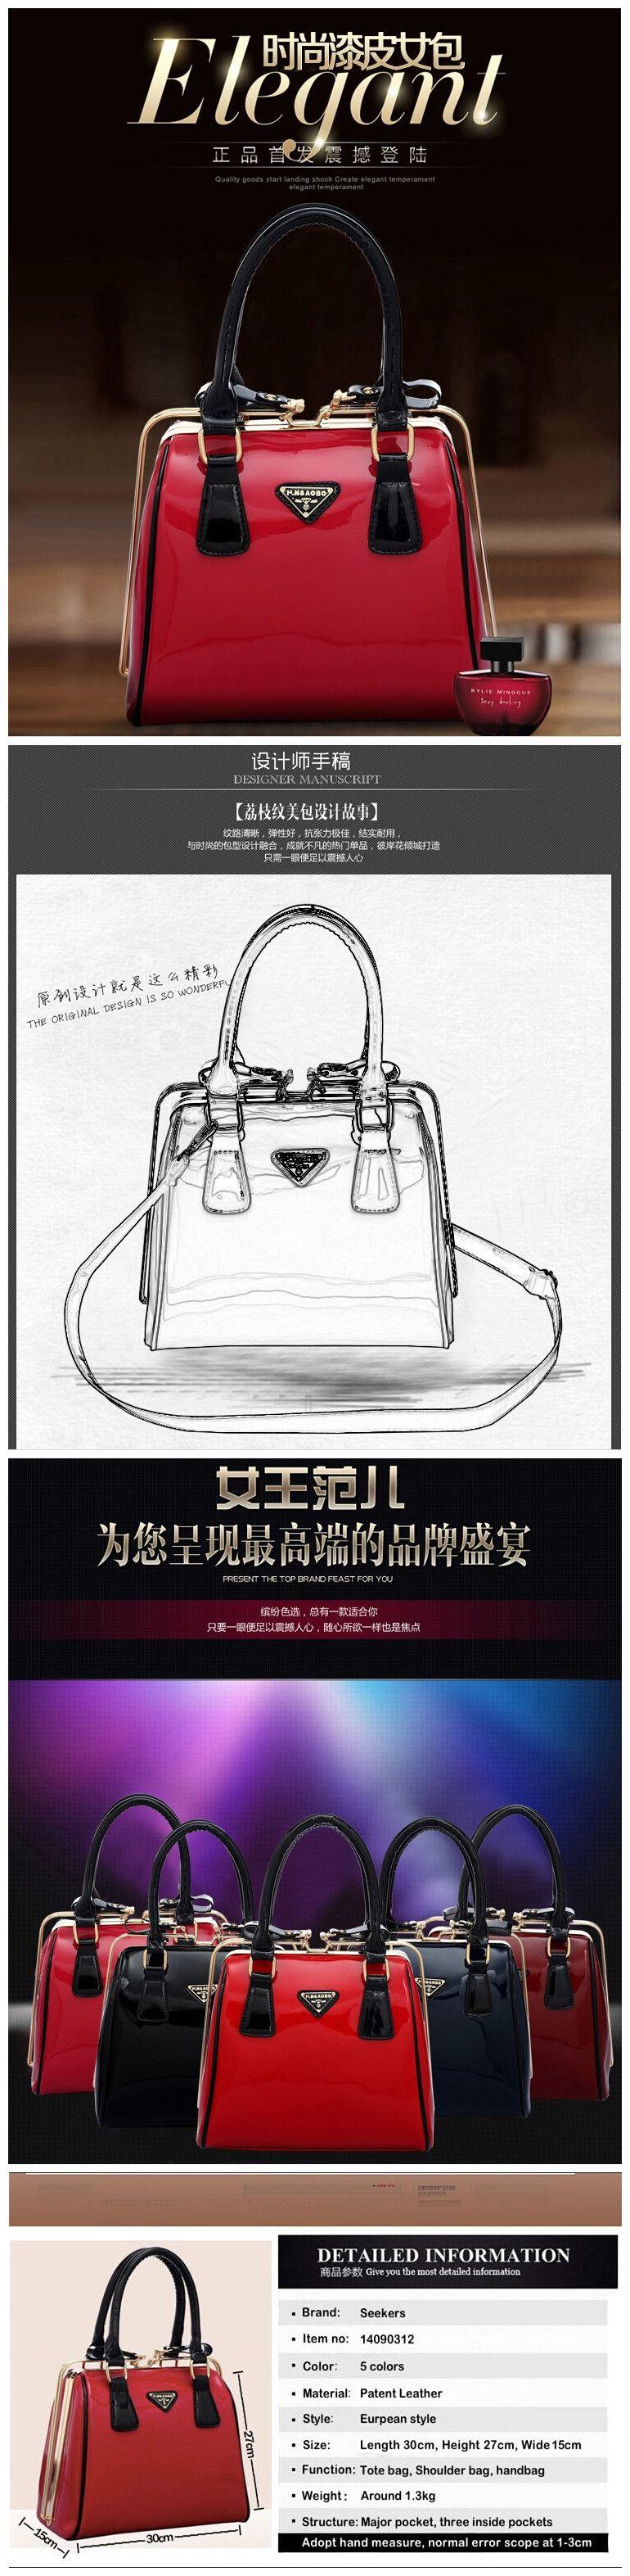 vintage patent leather handbags,womens tote bags,brand handbags$48.85